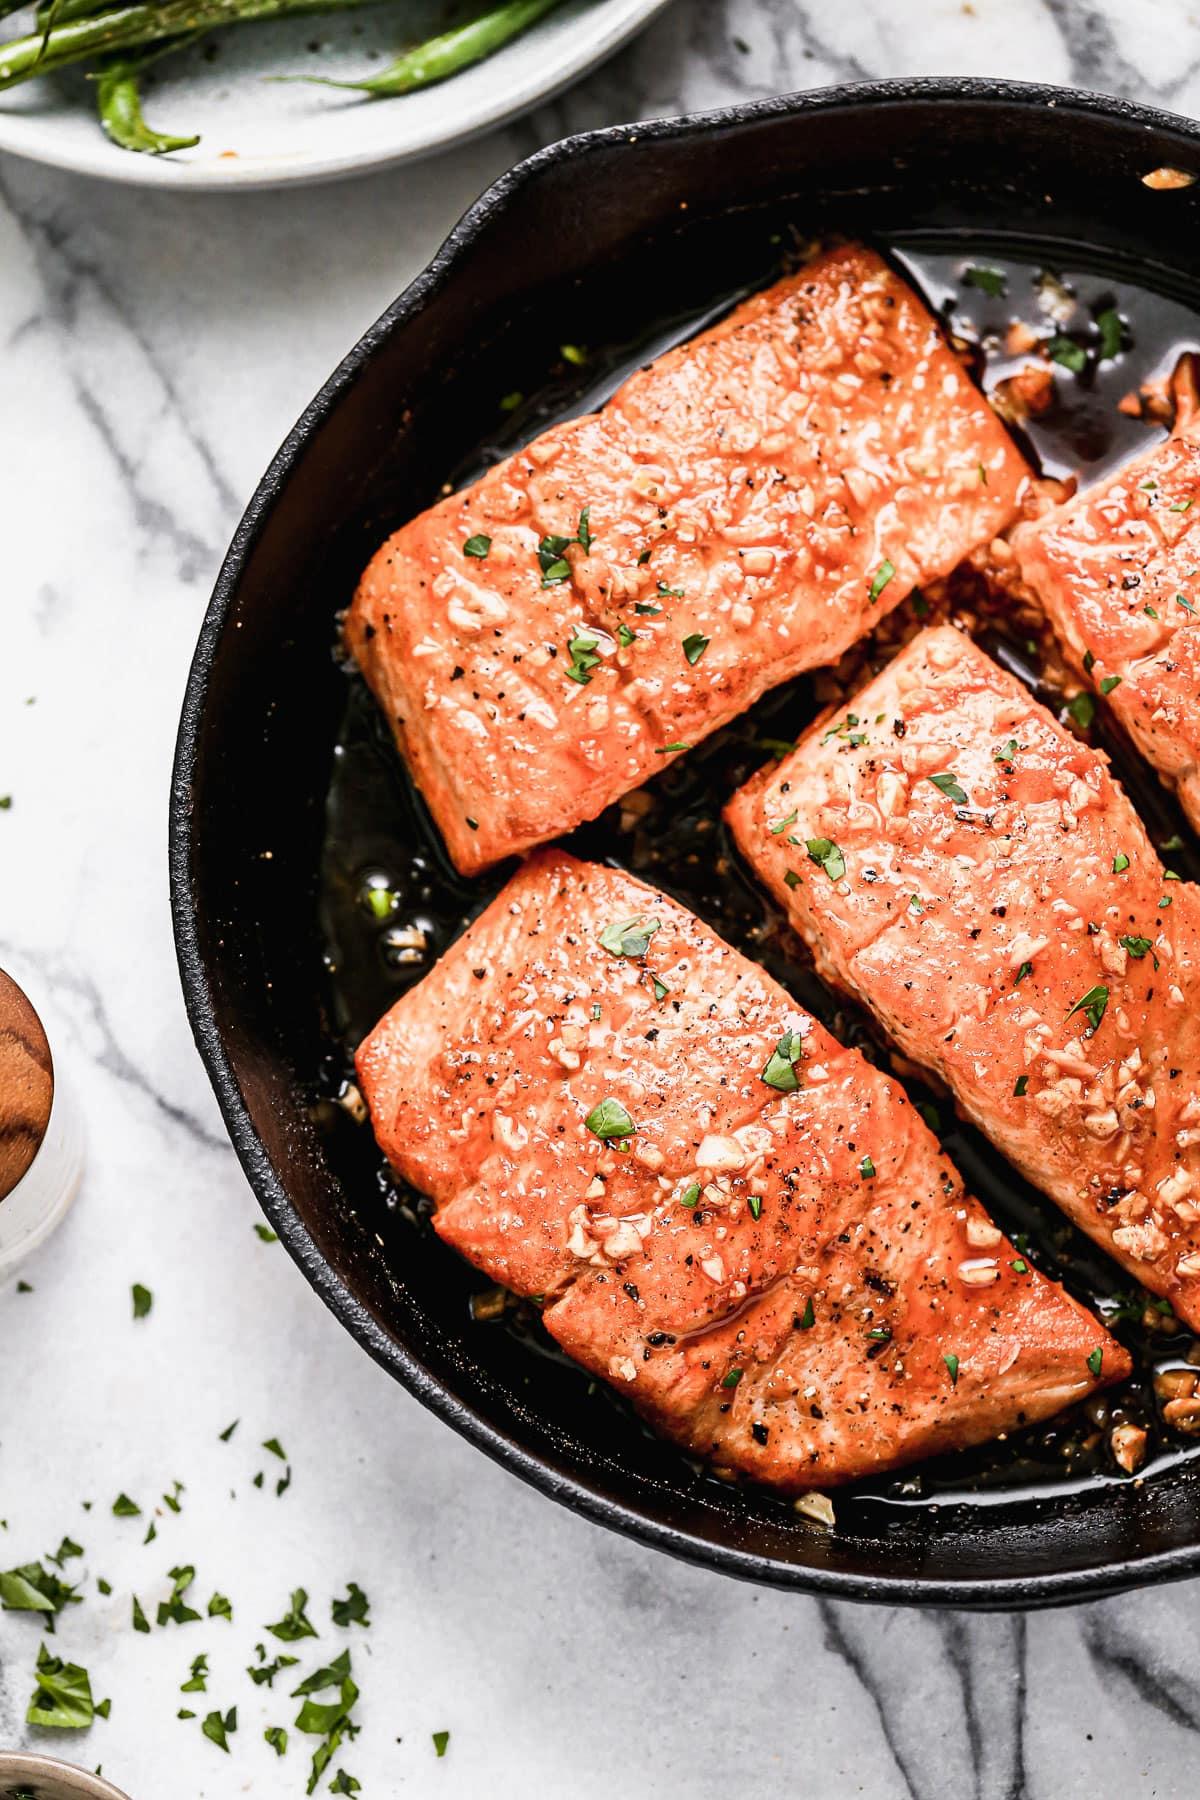 Four fillets of easy honey garlic salmon